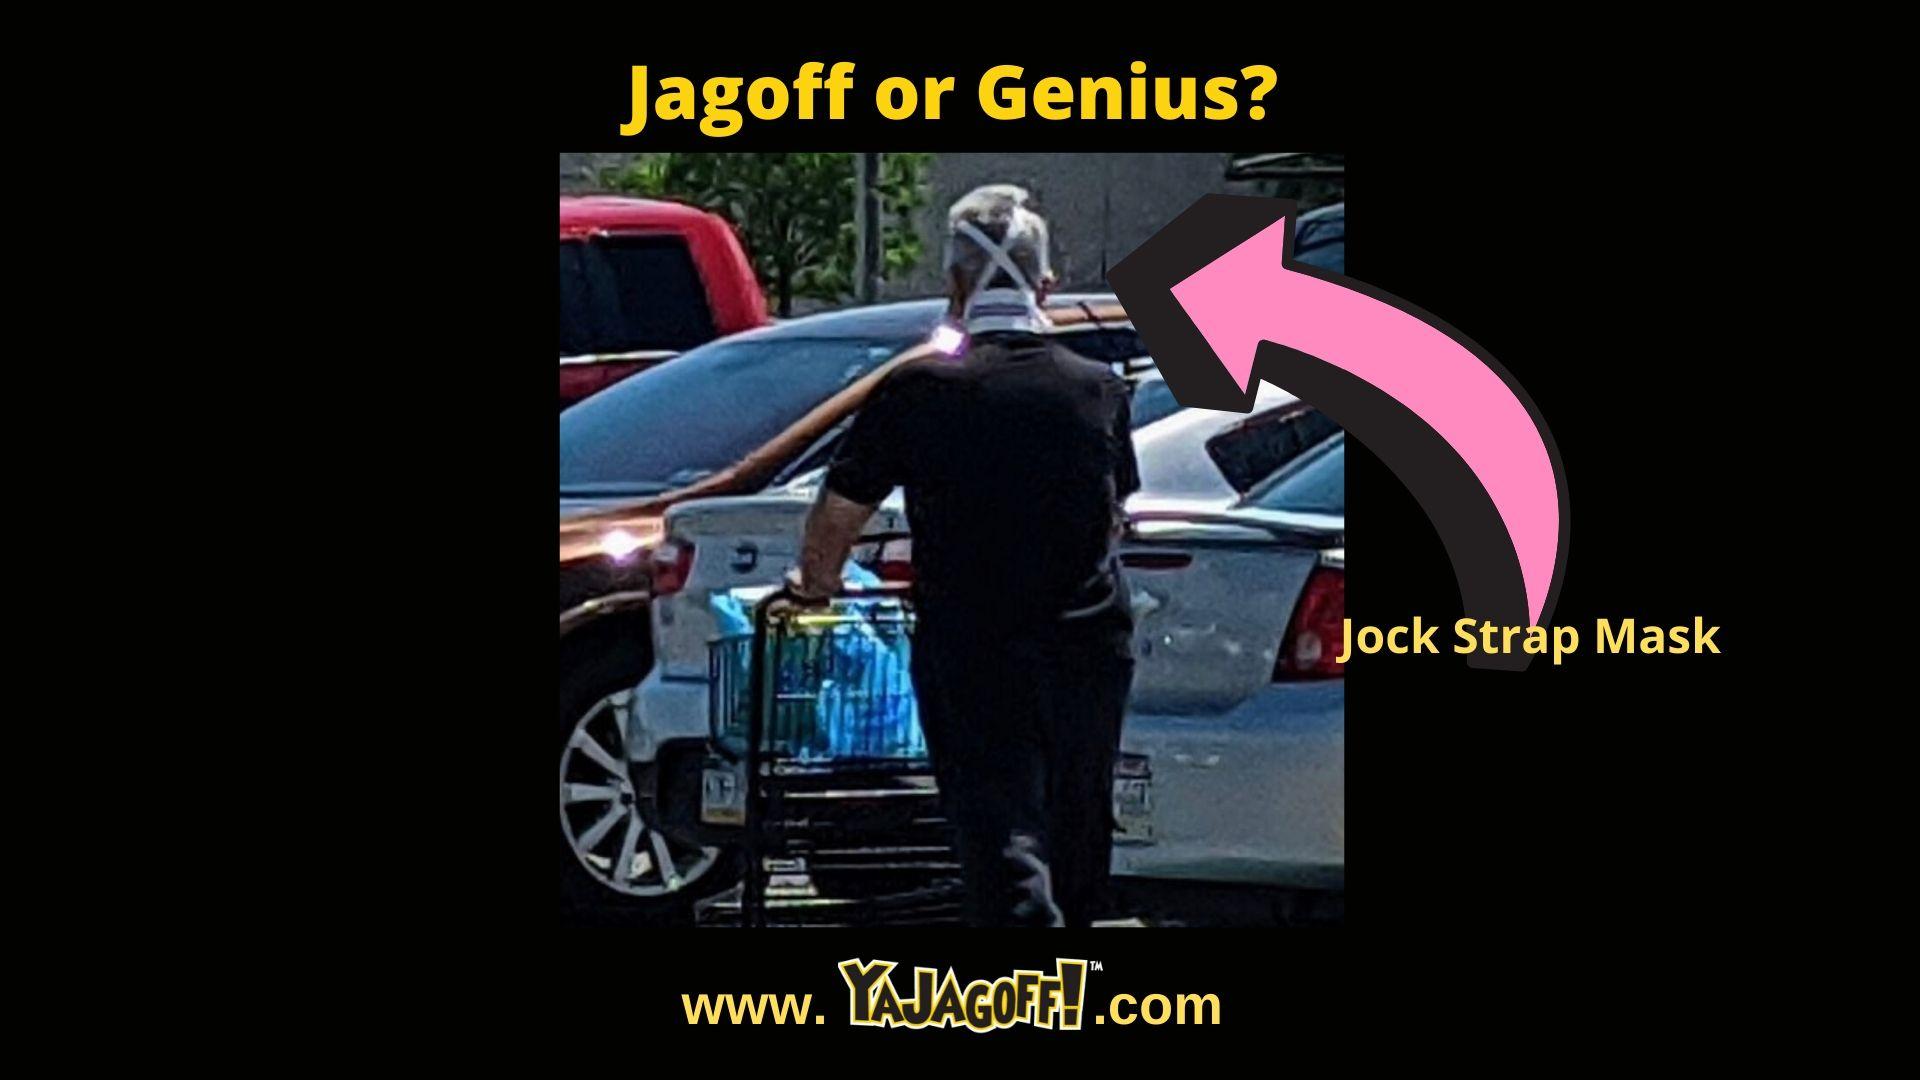 YaJagoff Podcast and Blog Jock Strap